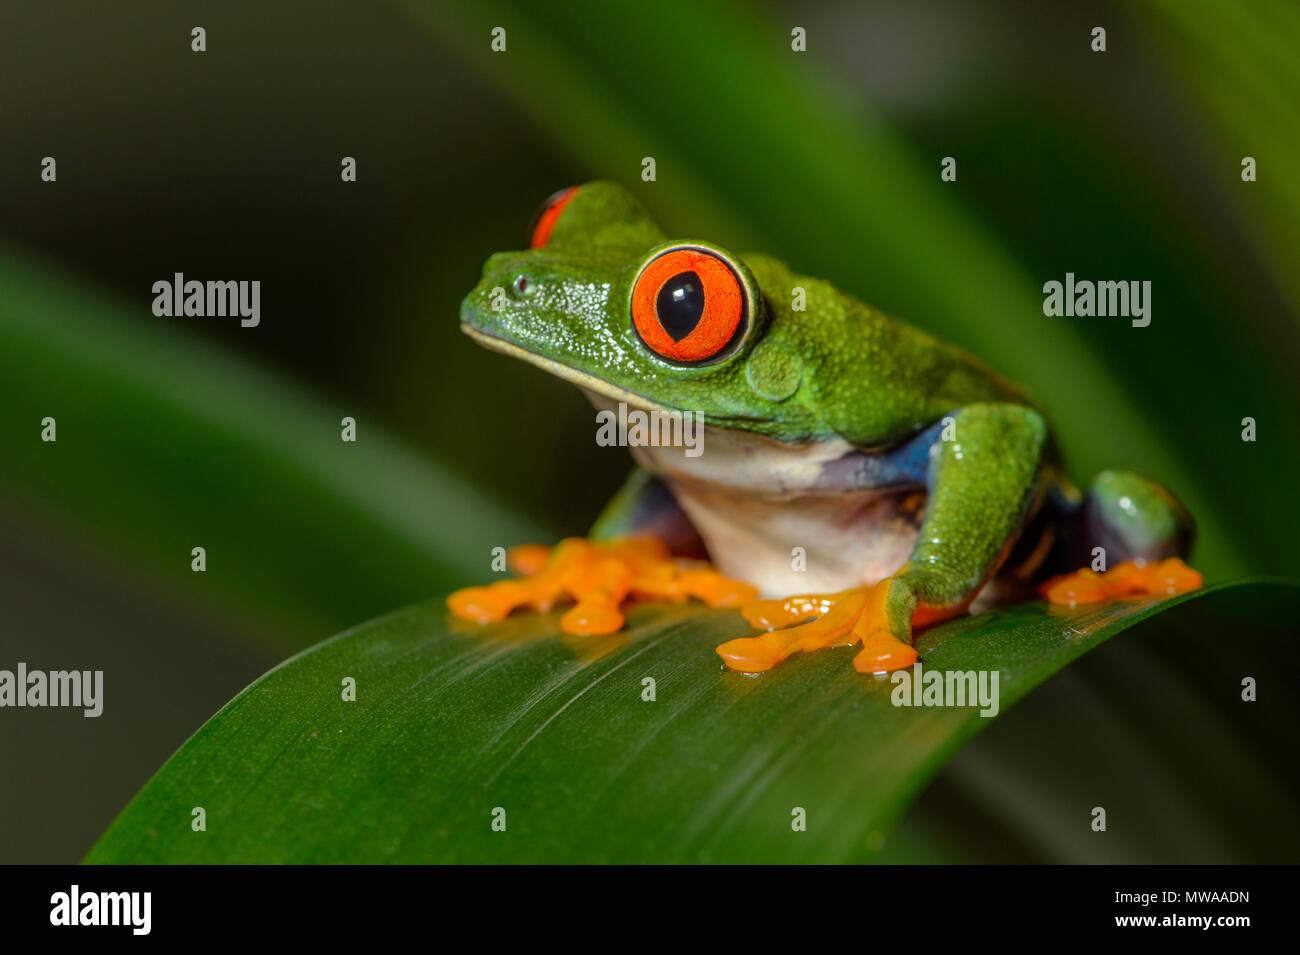 Red-eyed Tree Frog (Agalychnis callidryas), Captive, Reptilia reptile zoo, Vaughan, Ontario, Canada - Stock Image